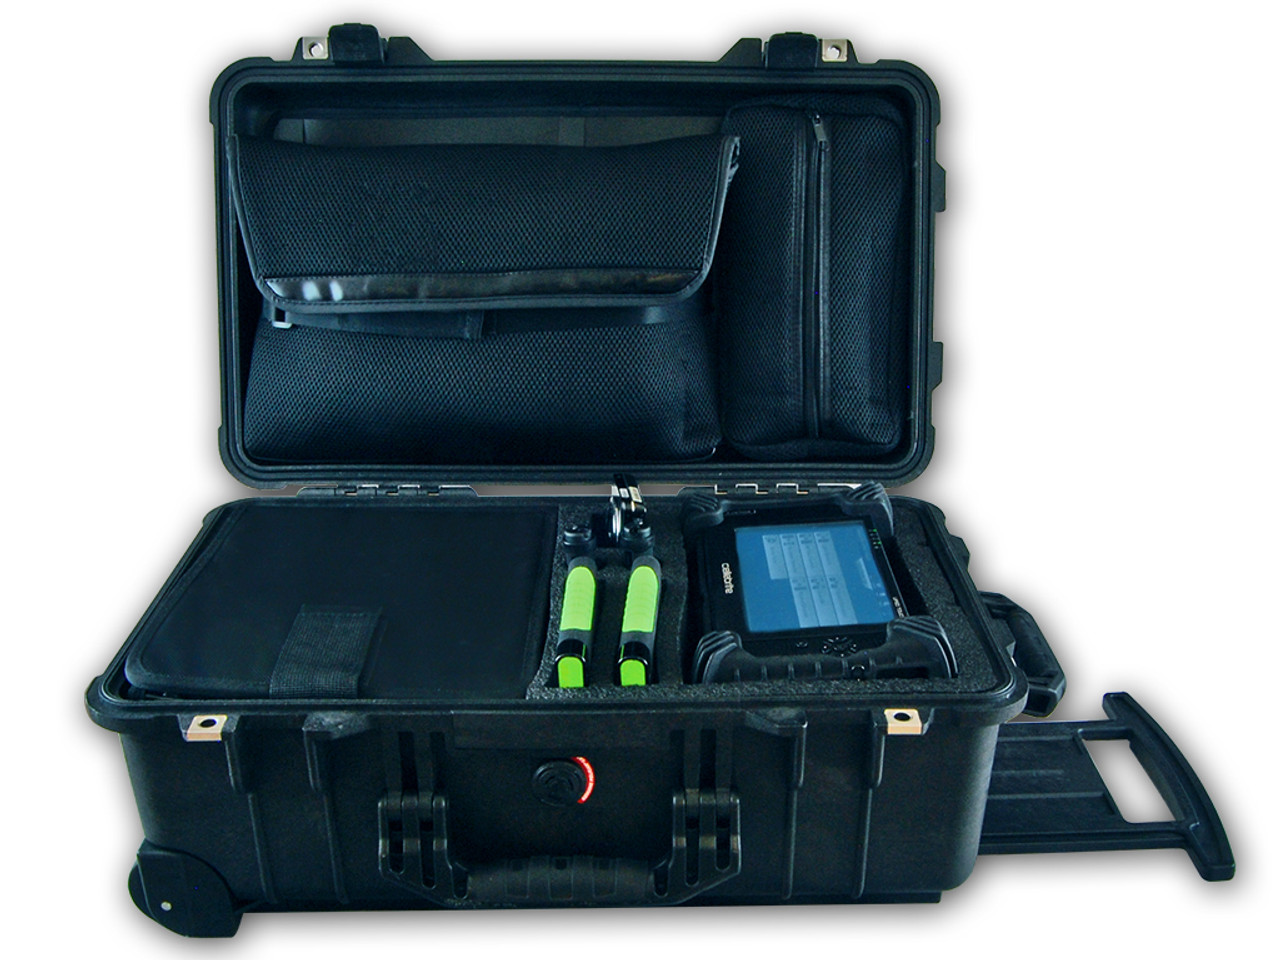 Momentum MT400 Digital Forensics Mobile Triage Kit-5